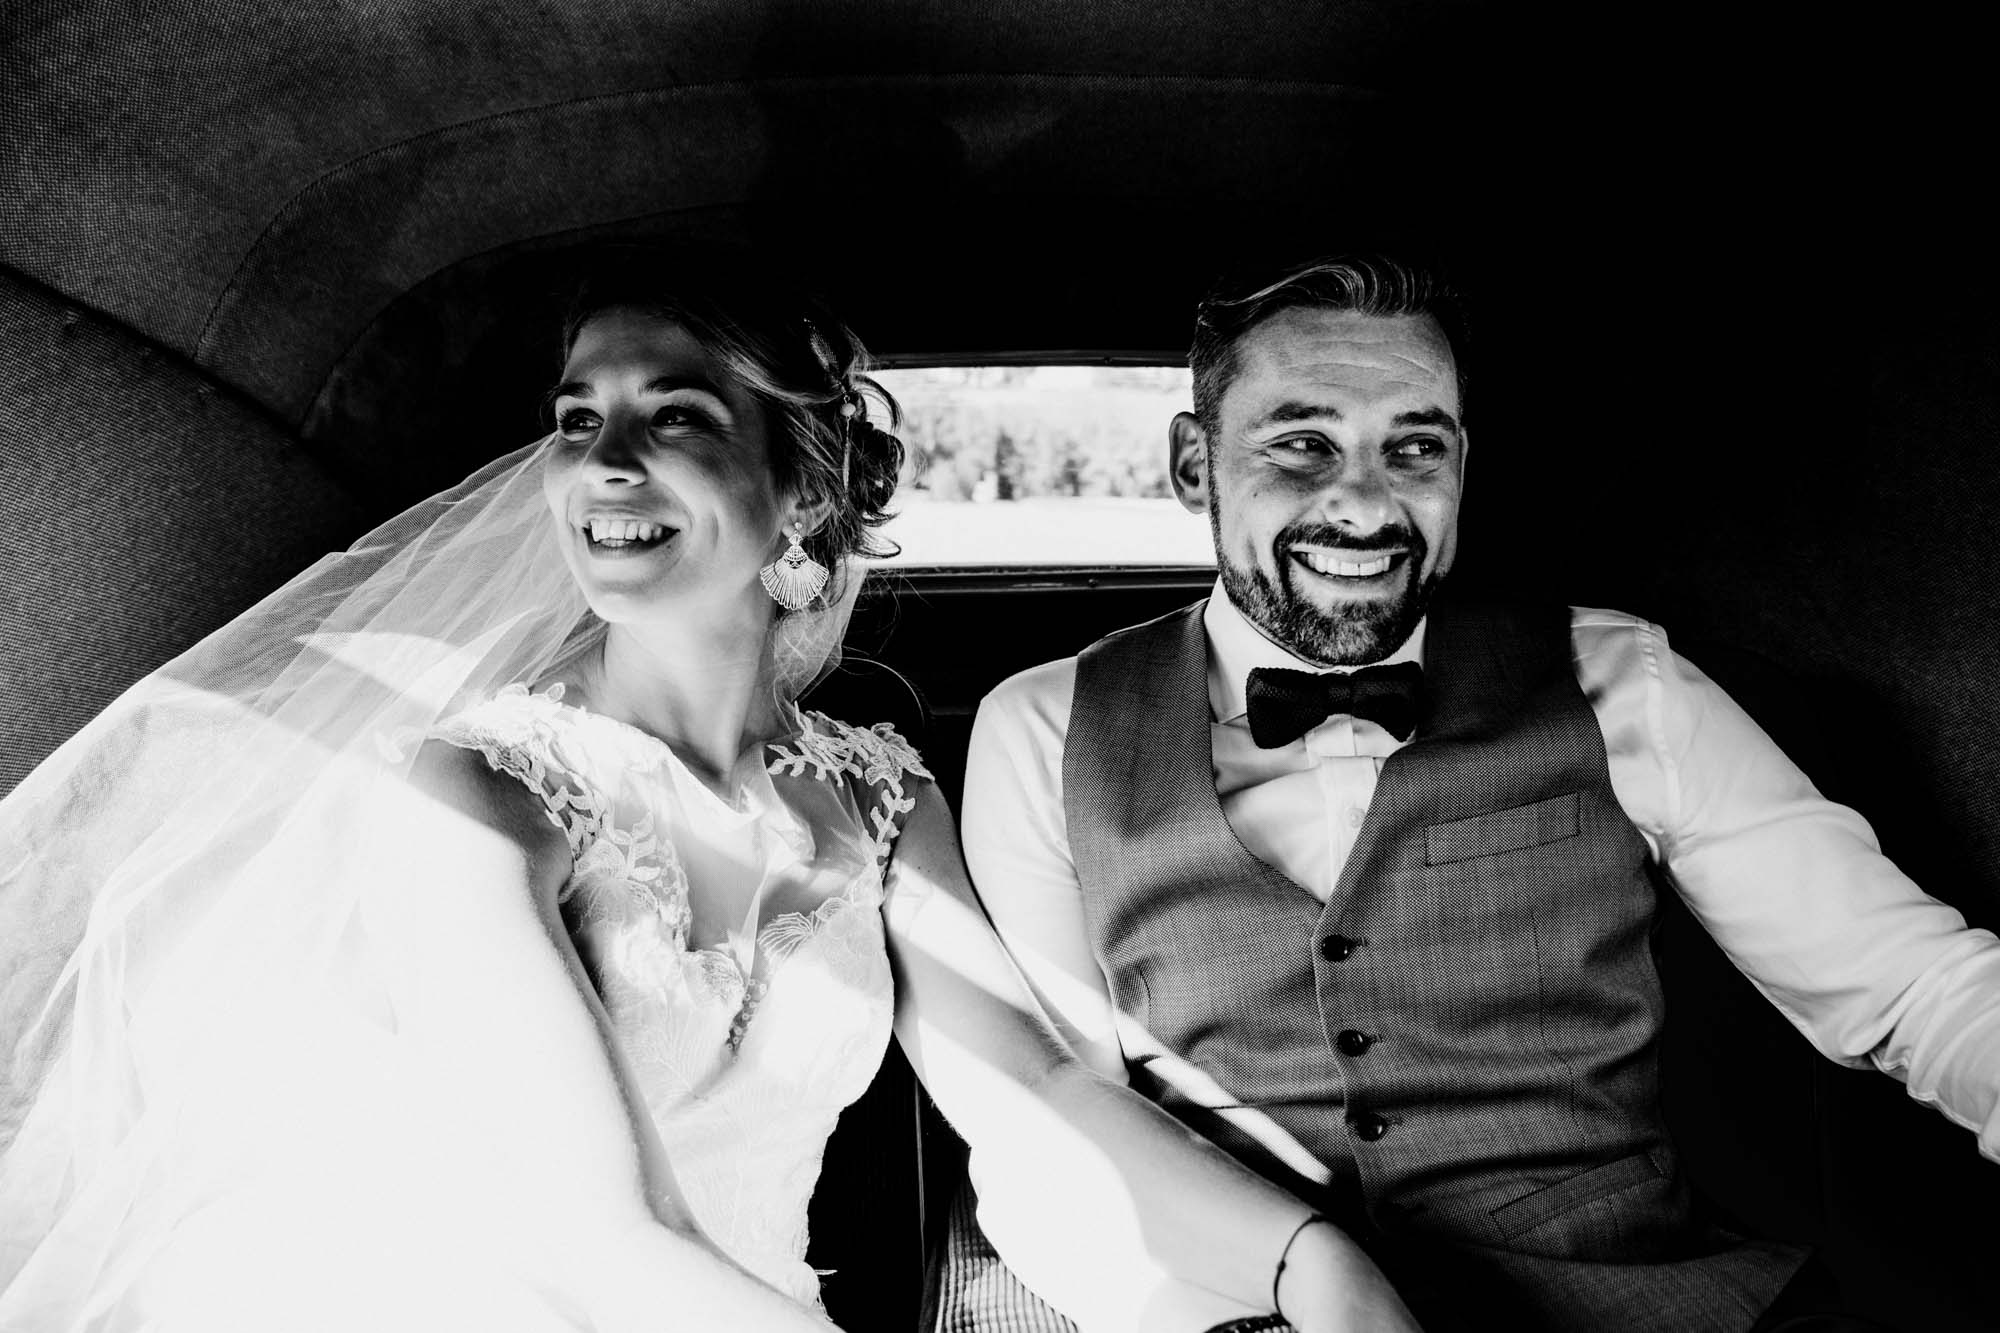 2018-09-29 - LD8_1132 - photographe mariage lyon - laurie diaz - www.lauriediazweeding.com.jpg